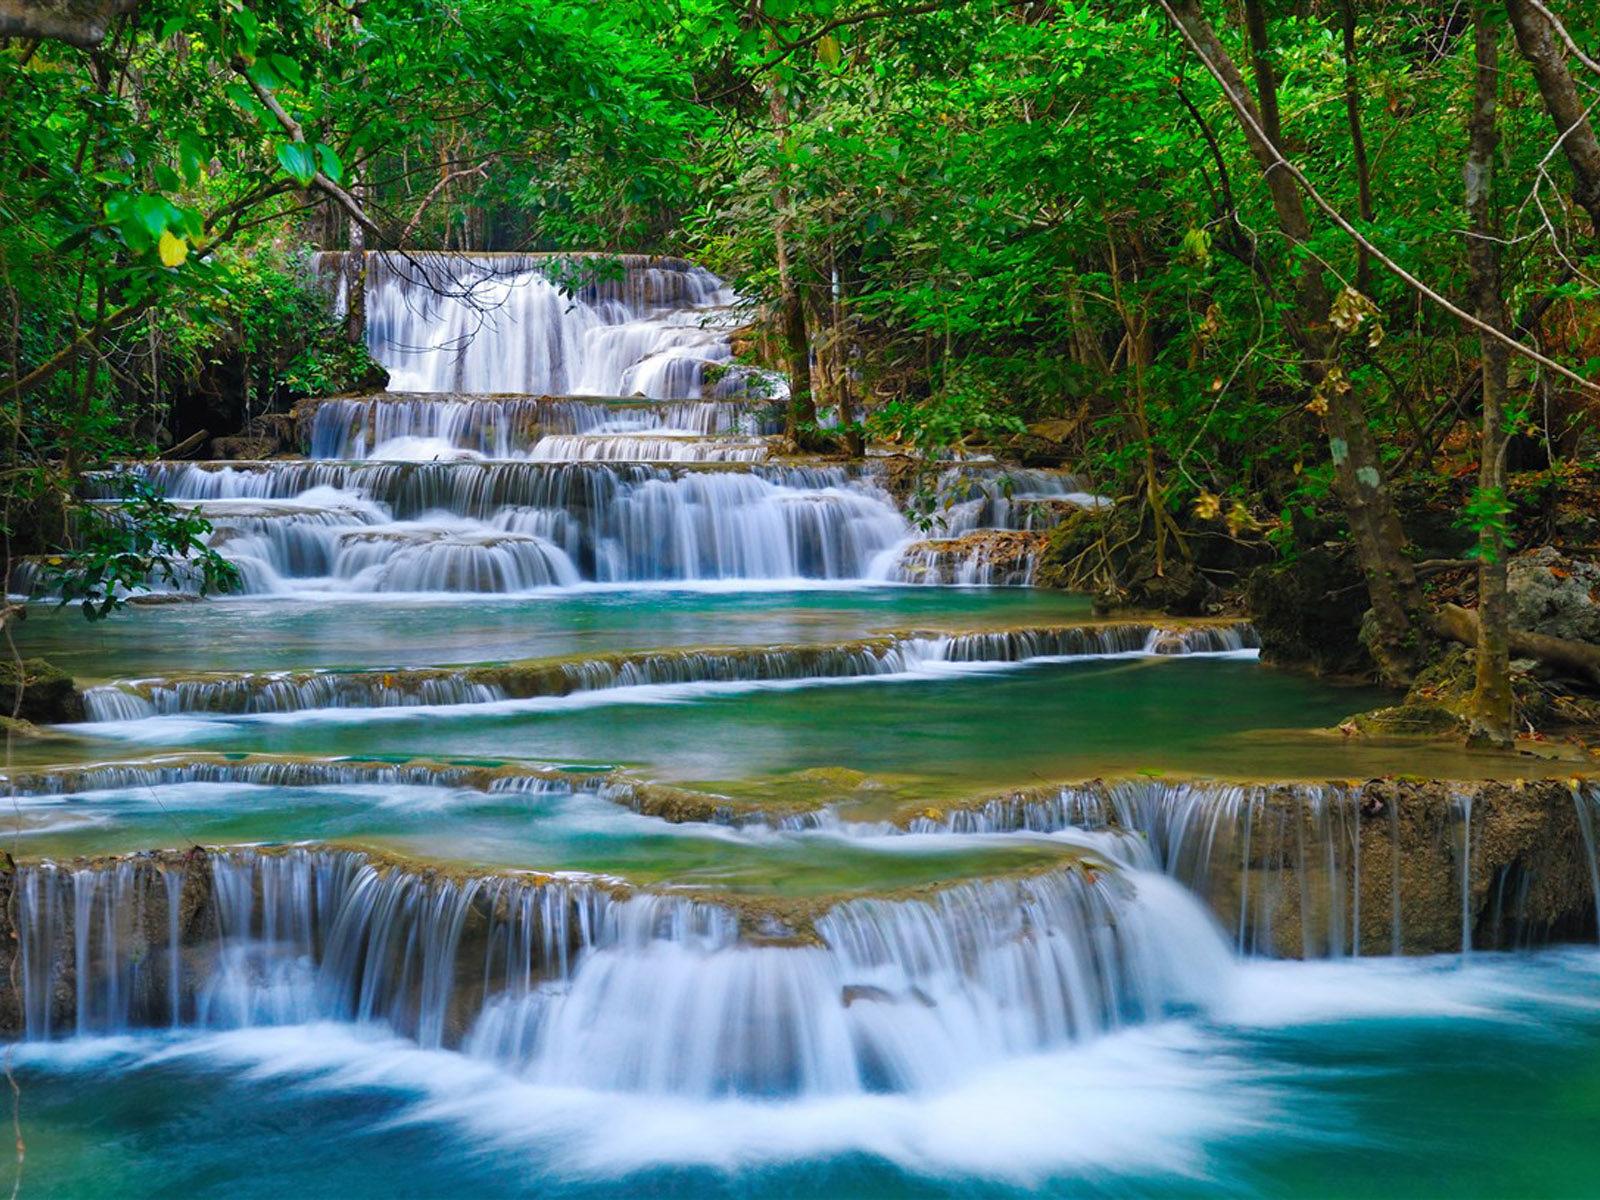 Fall Wallpaper Hd 1280x1024 Tropical Cascade Waterfall In Kanchanaburi Thailand Nature